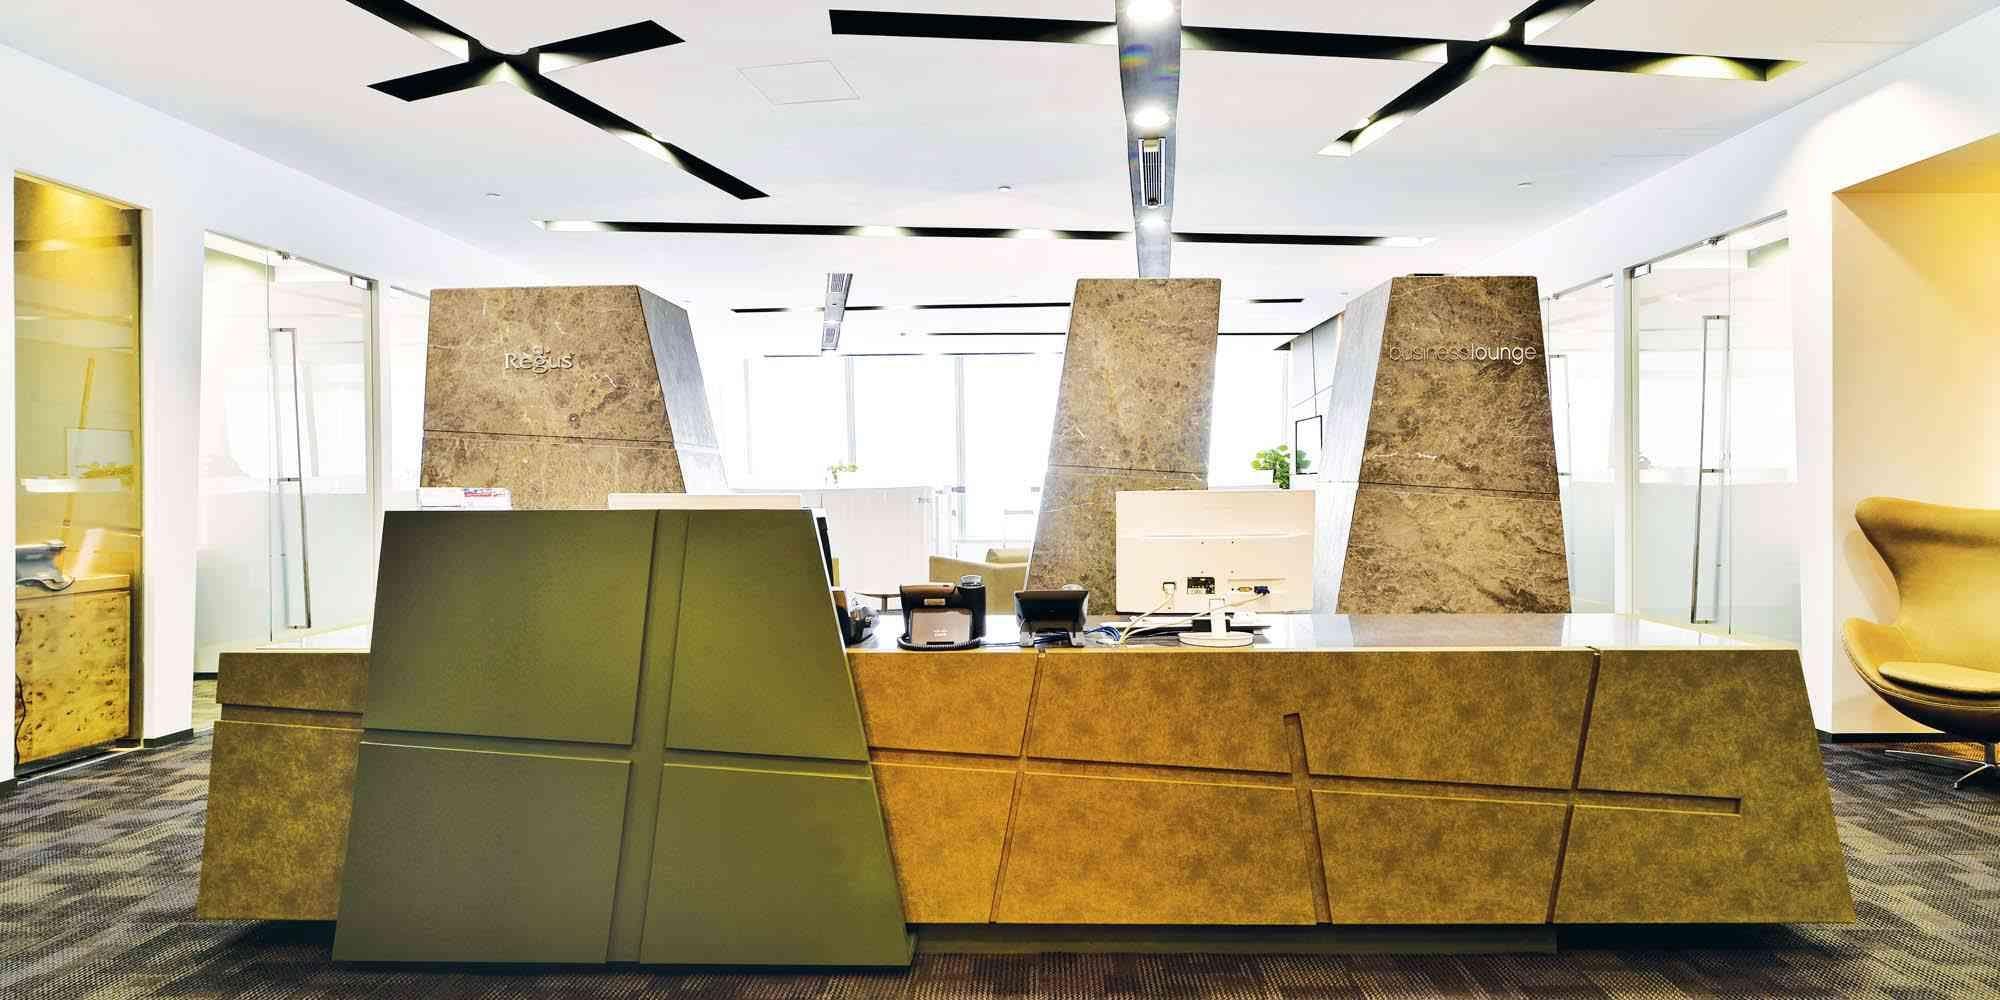 Design Interior Regus Icc Hong Kong I Fva Archinect